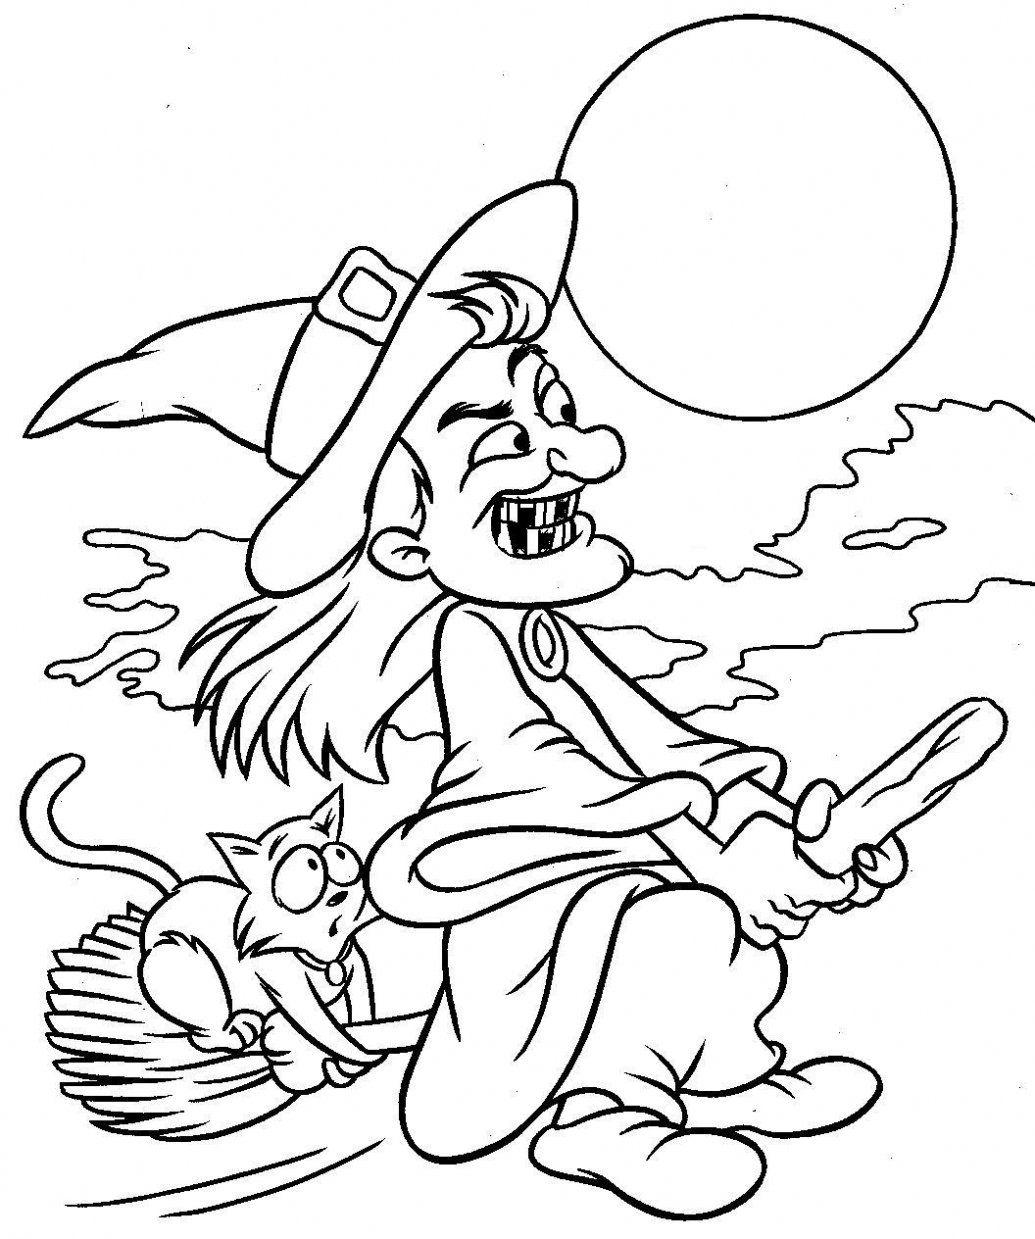 brujas,para,colorear,imprimir,pintar,dibujos,bruja,dibujos,infantiles